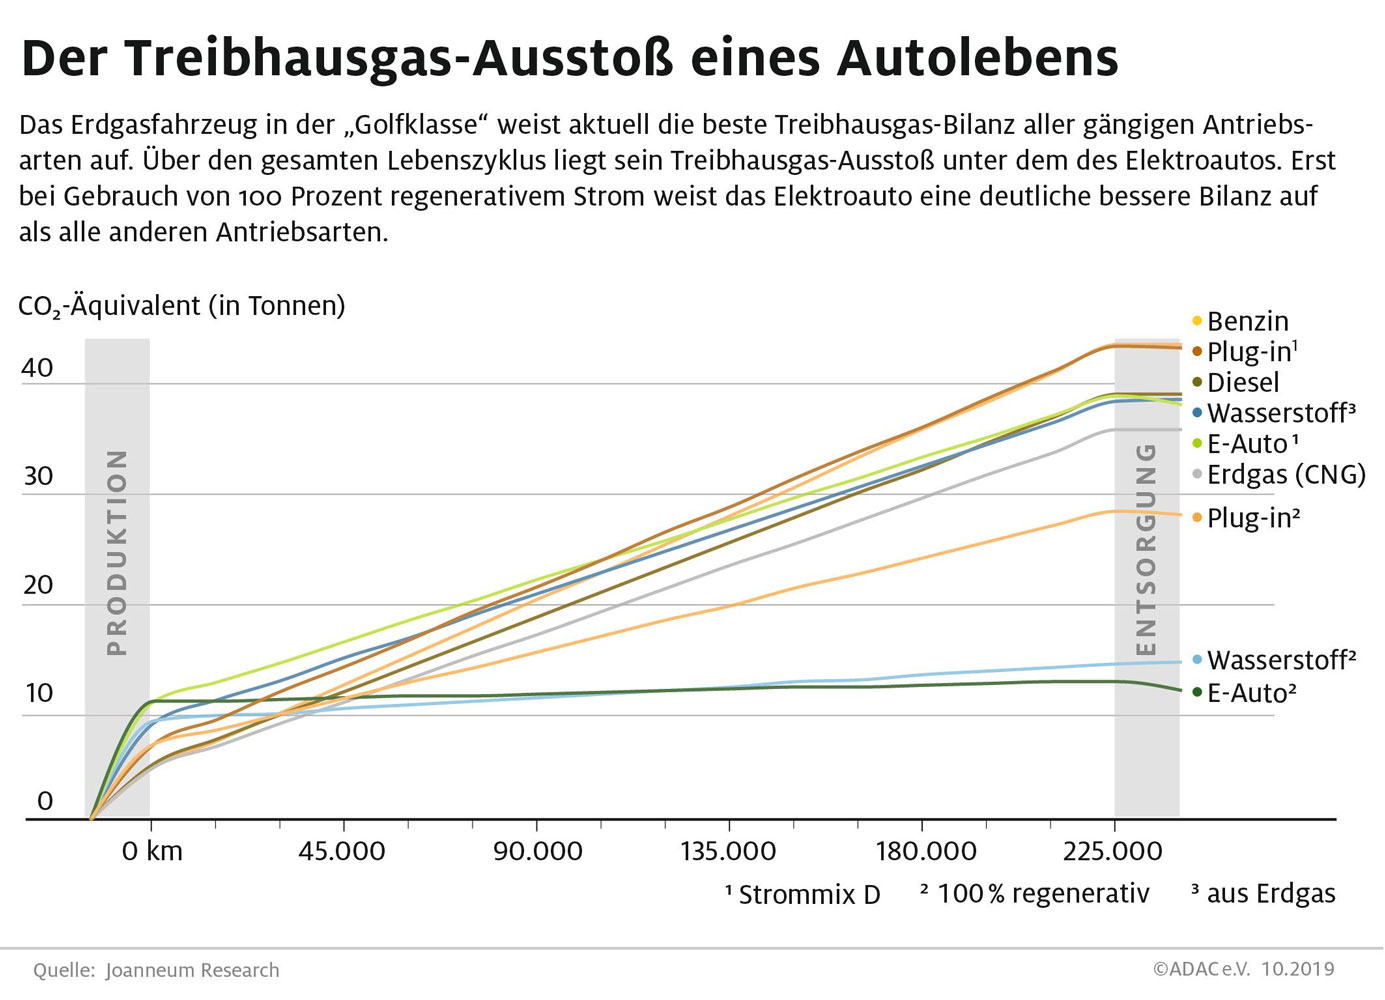 ADAC-Elektroauto-Lebenszyklus-Analyse